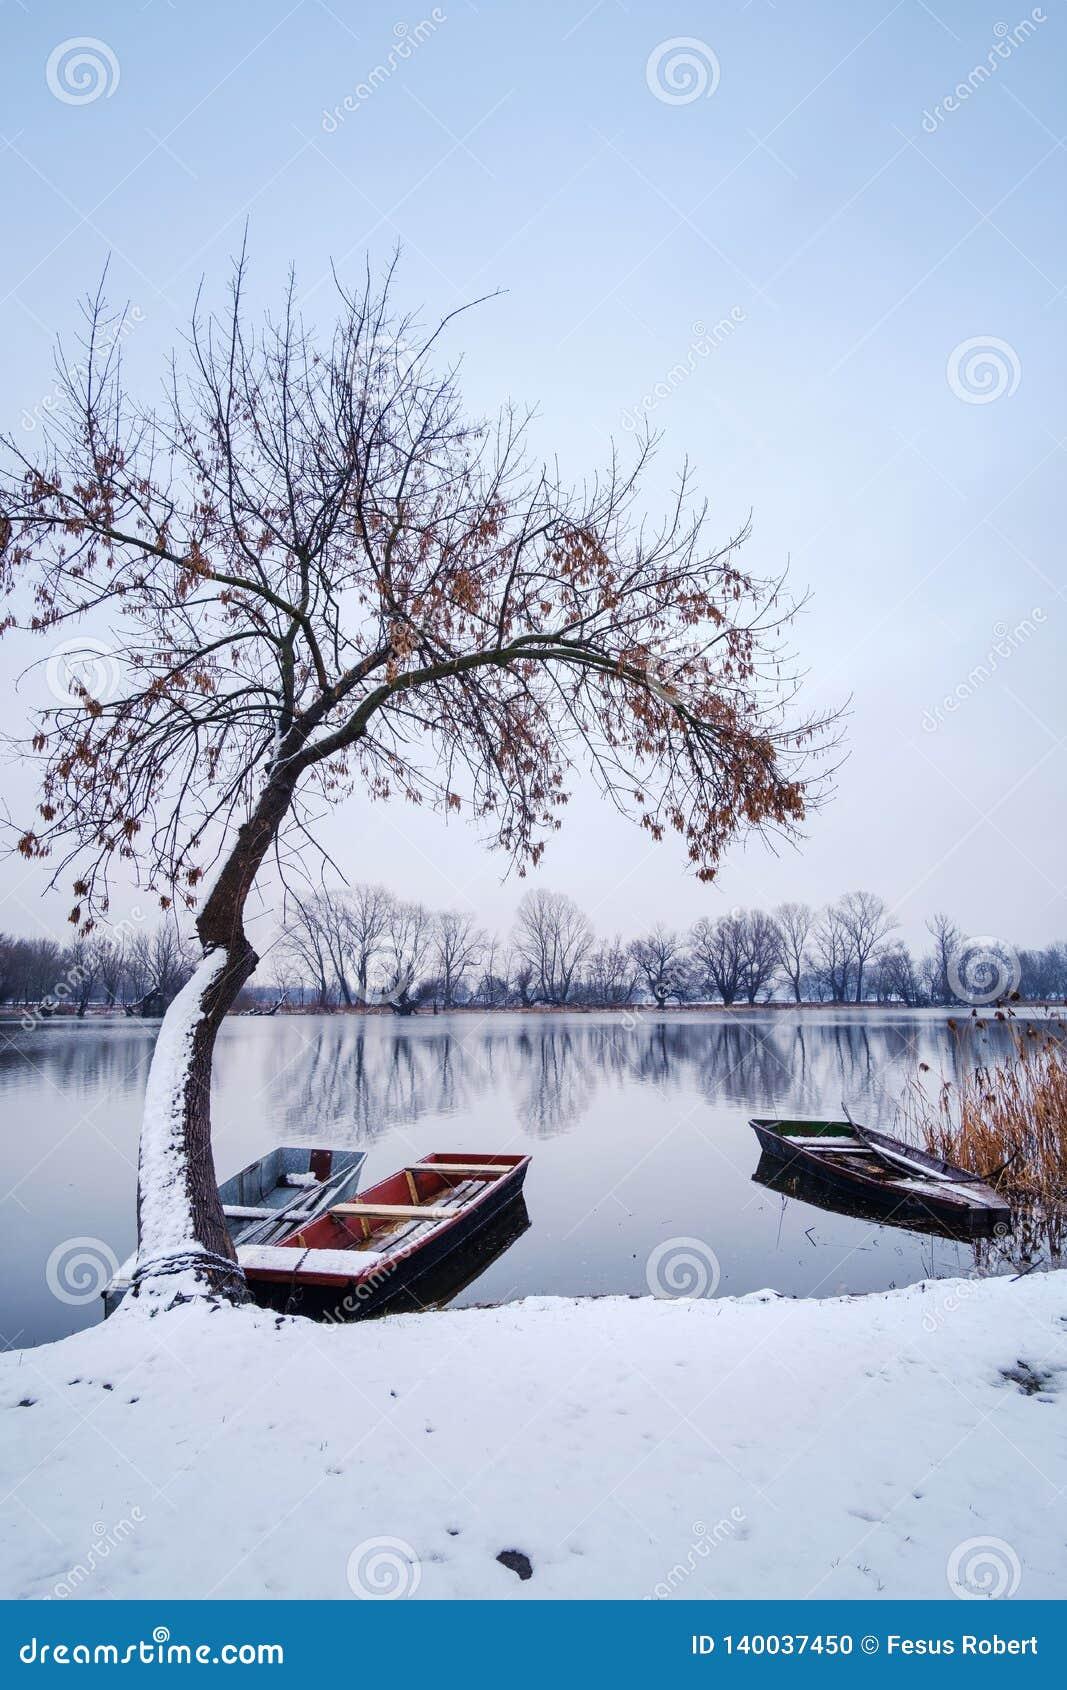 Flussboot auf Fluss-Schneelandschaft des Winters gefrorener